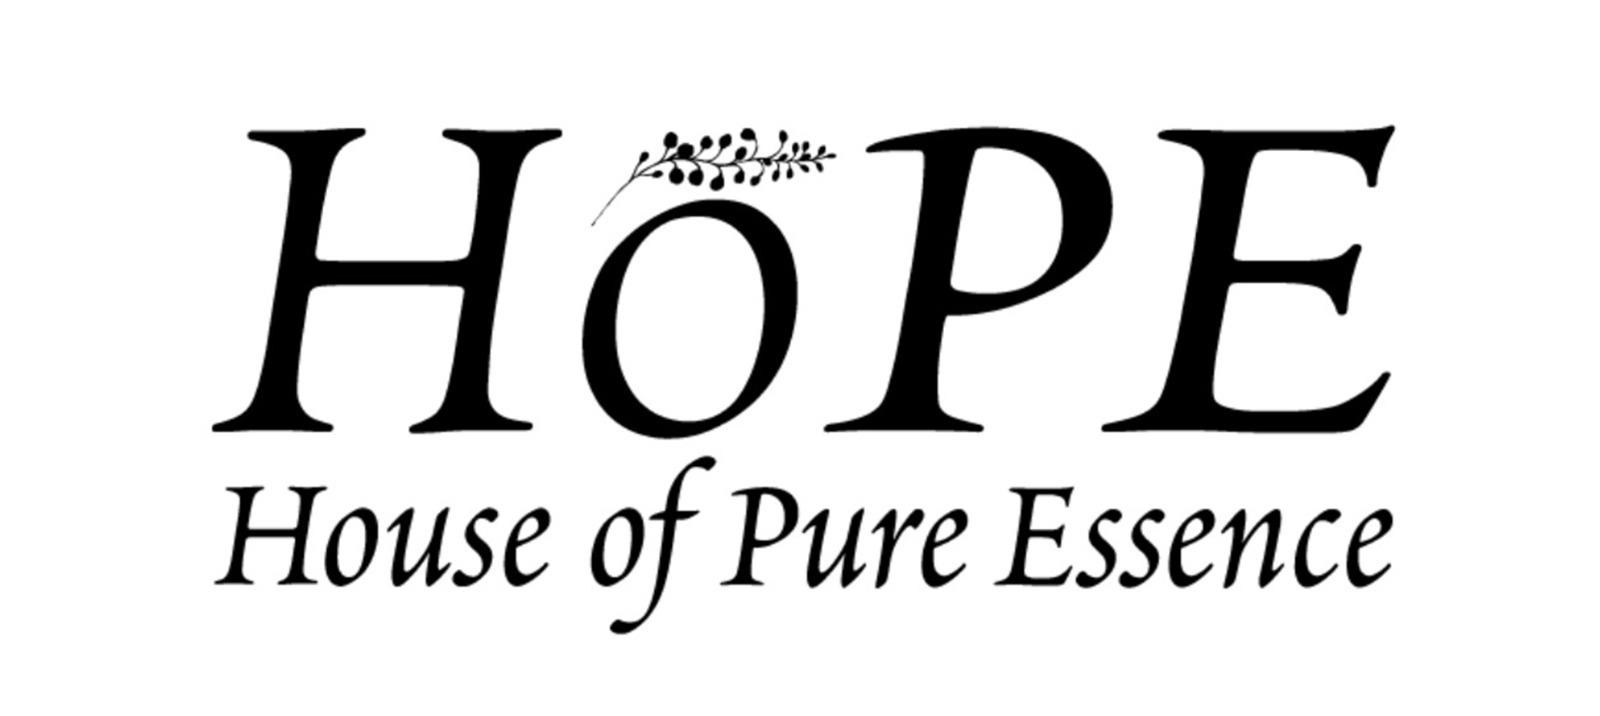 HOPE,有機精油,美容油,COSMOS 認證,有機純正,大自然產品,健康生活,安全有效,美容,家居,健康,保健